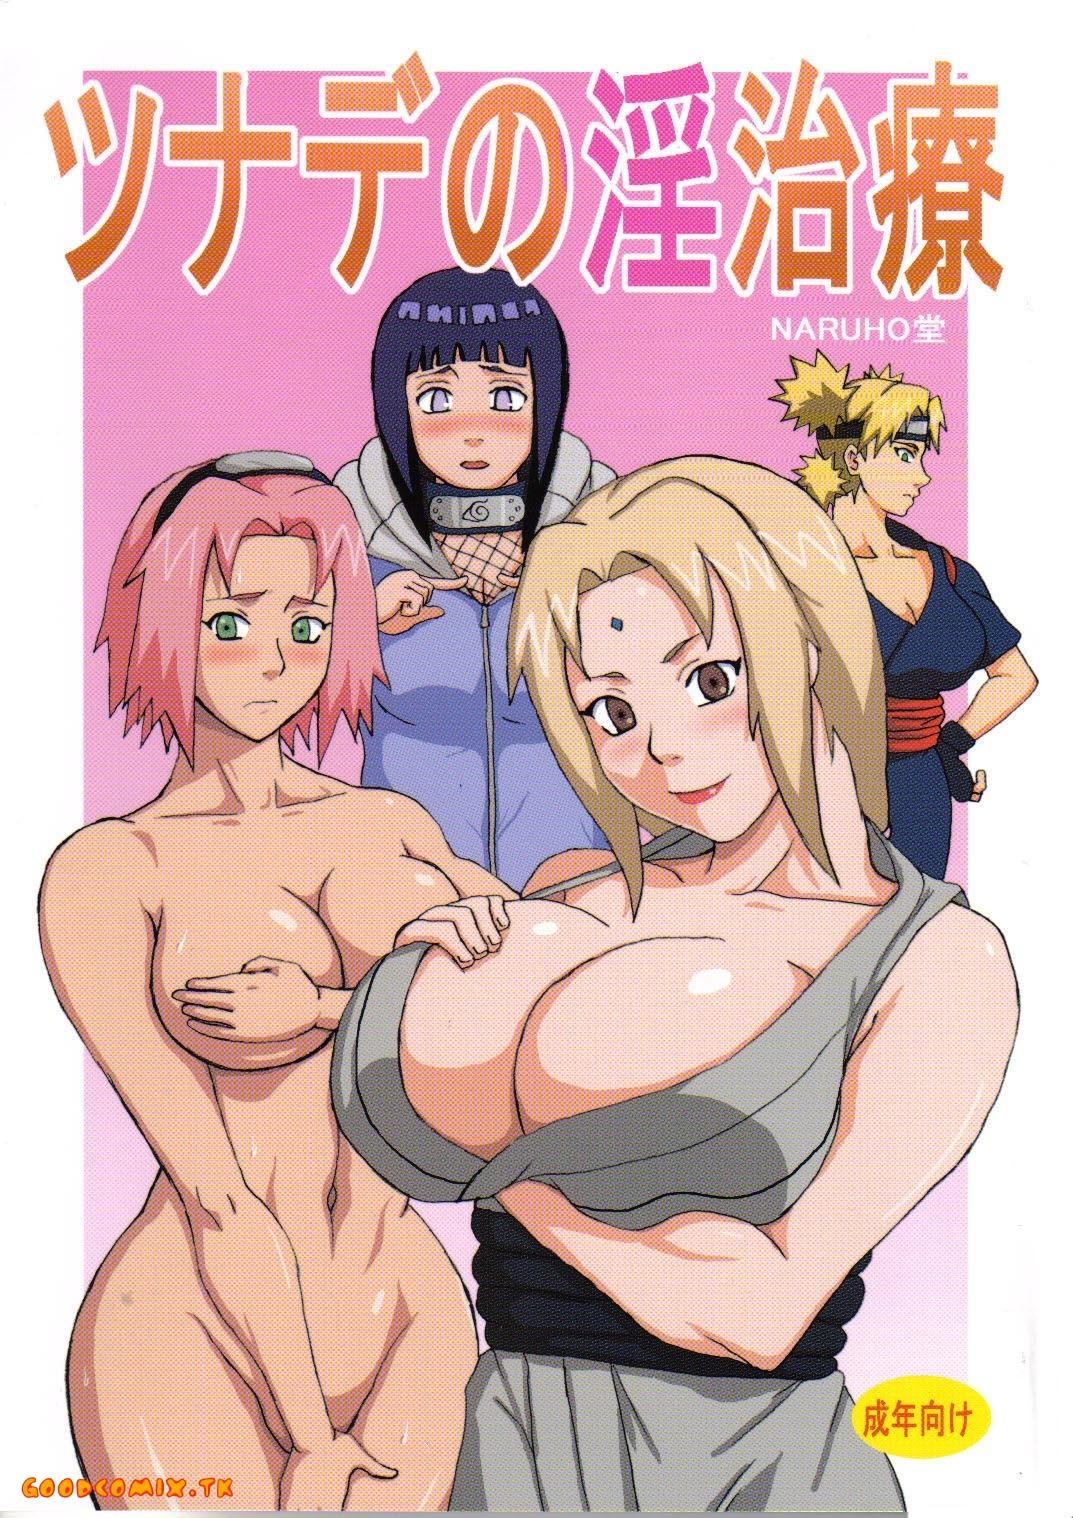 Goodcomix.tk Naruto - [Naruho-dou (Naruhodo)] - Tsunade's Sexual Therapy xxx porno